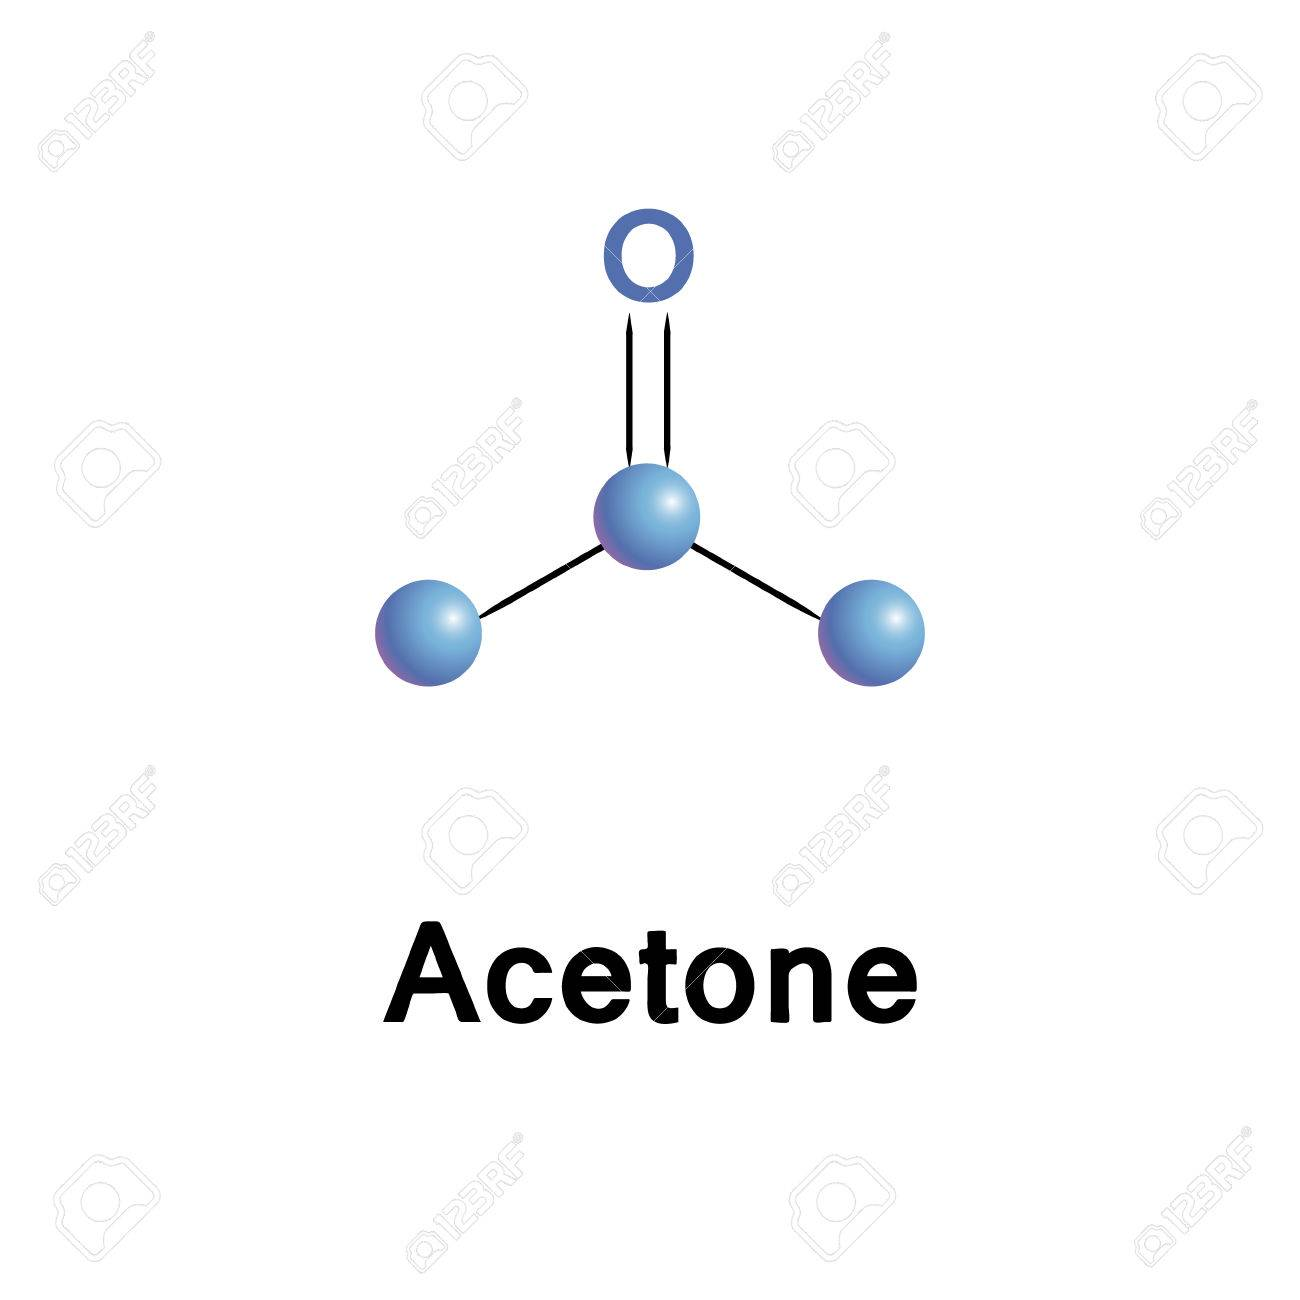 Acetone Chemical Formula, Molecule Structure, Medical Vector ...